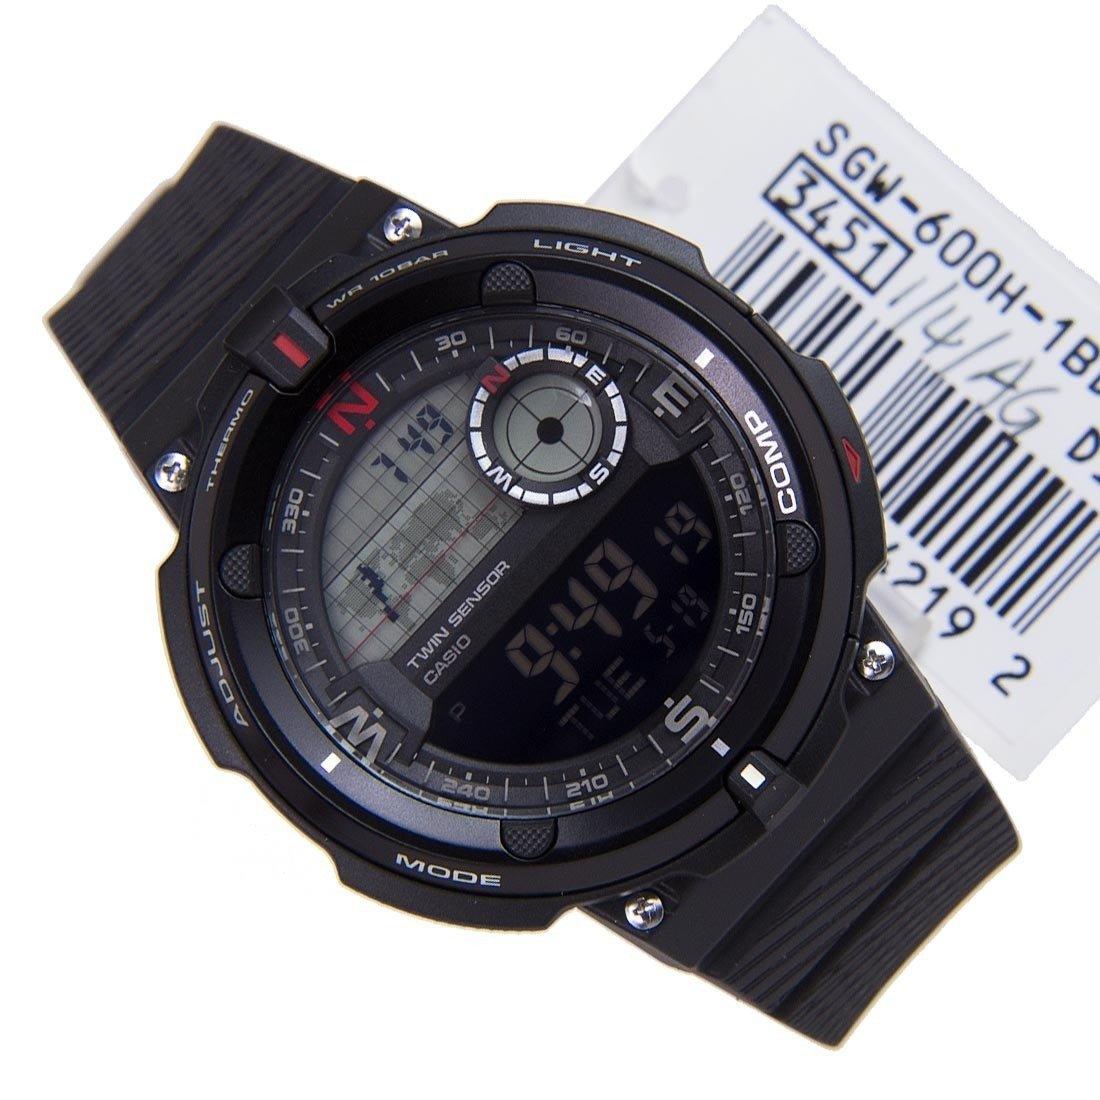 Reloj hombre Casio SGW-600H-1B Twin Sensor Brújula Termómetro